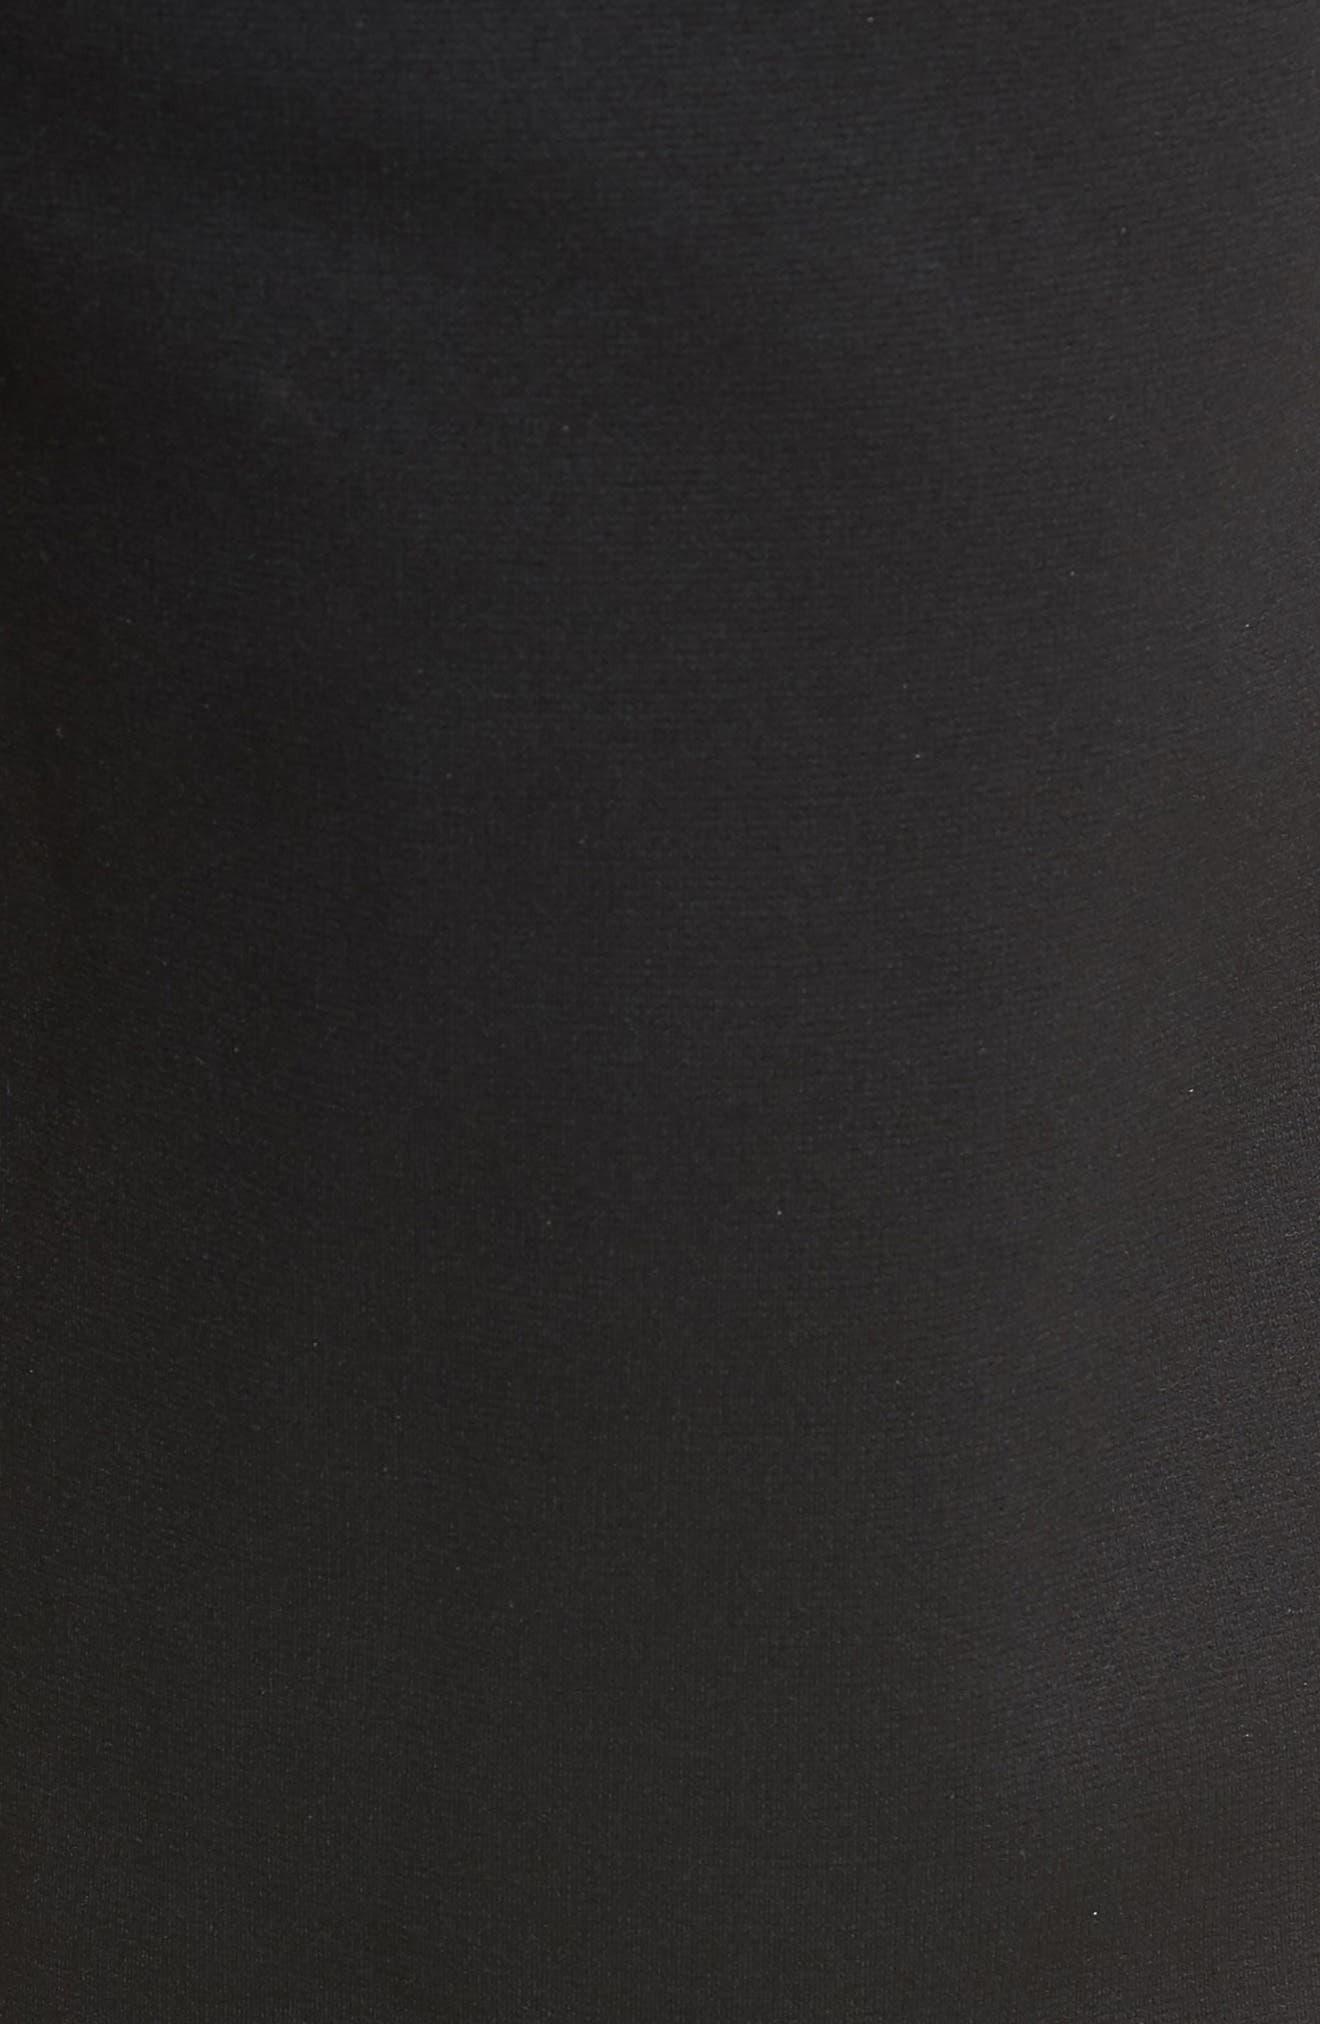 Therma Tapered Pants,                             Alternate thumbnail 5, color,                             BLACK/ WHITE